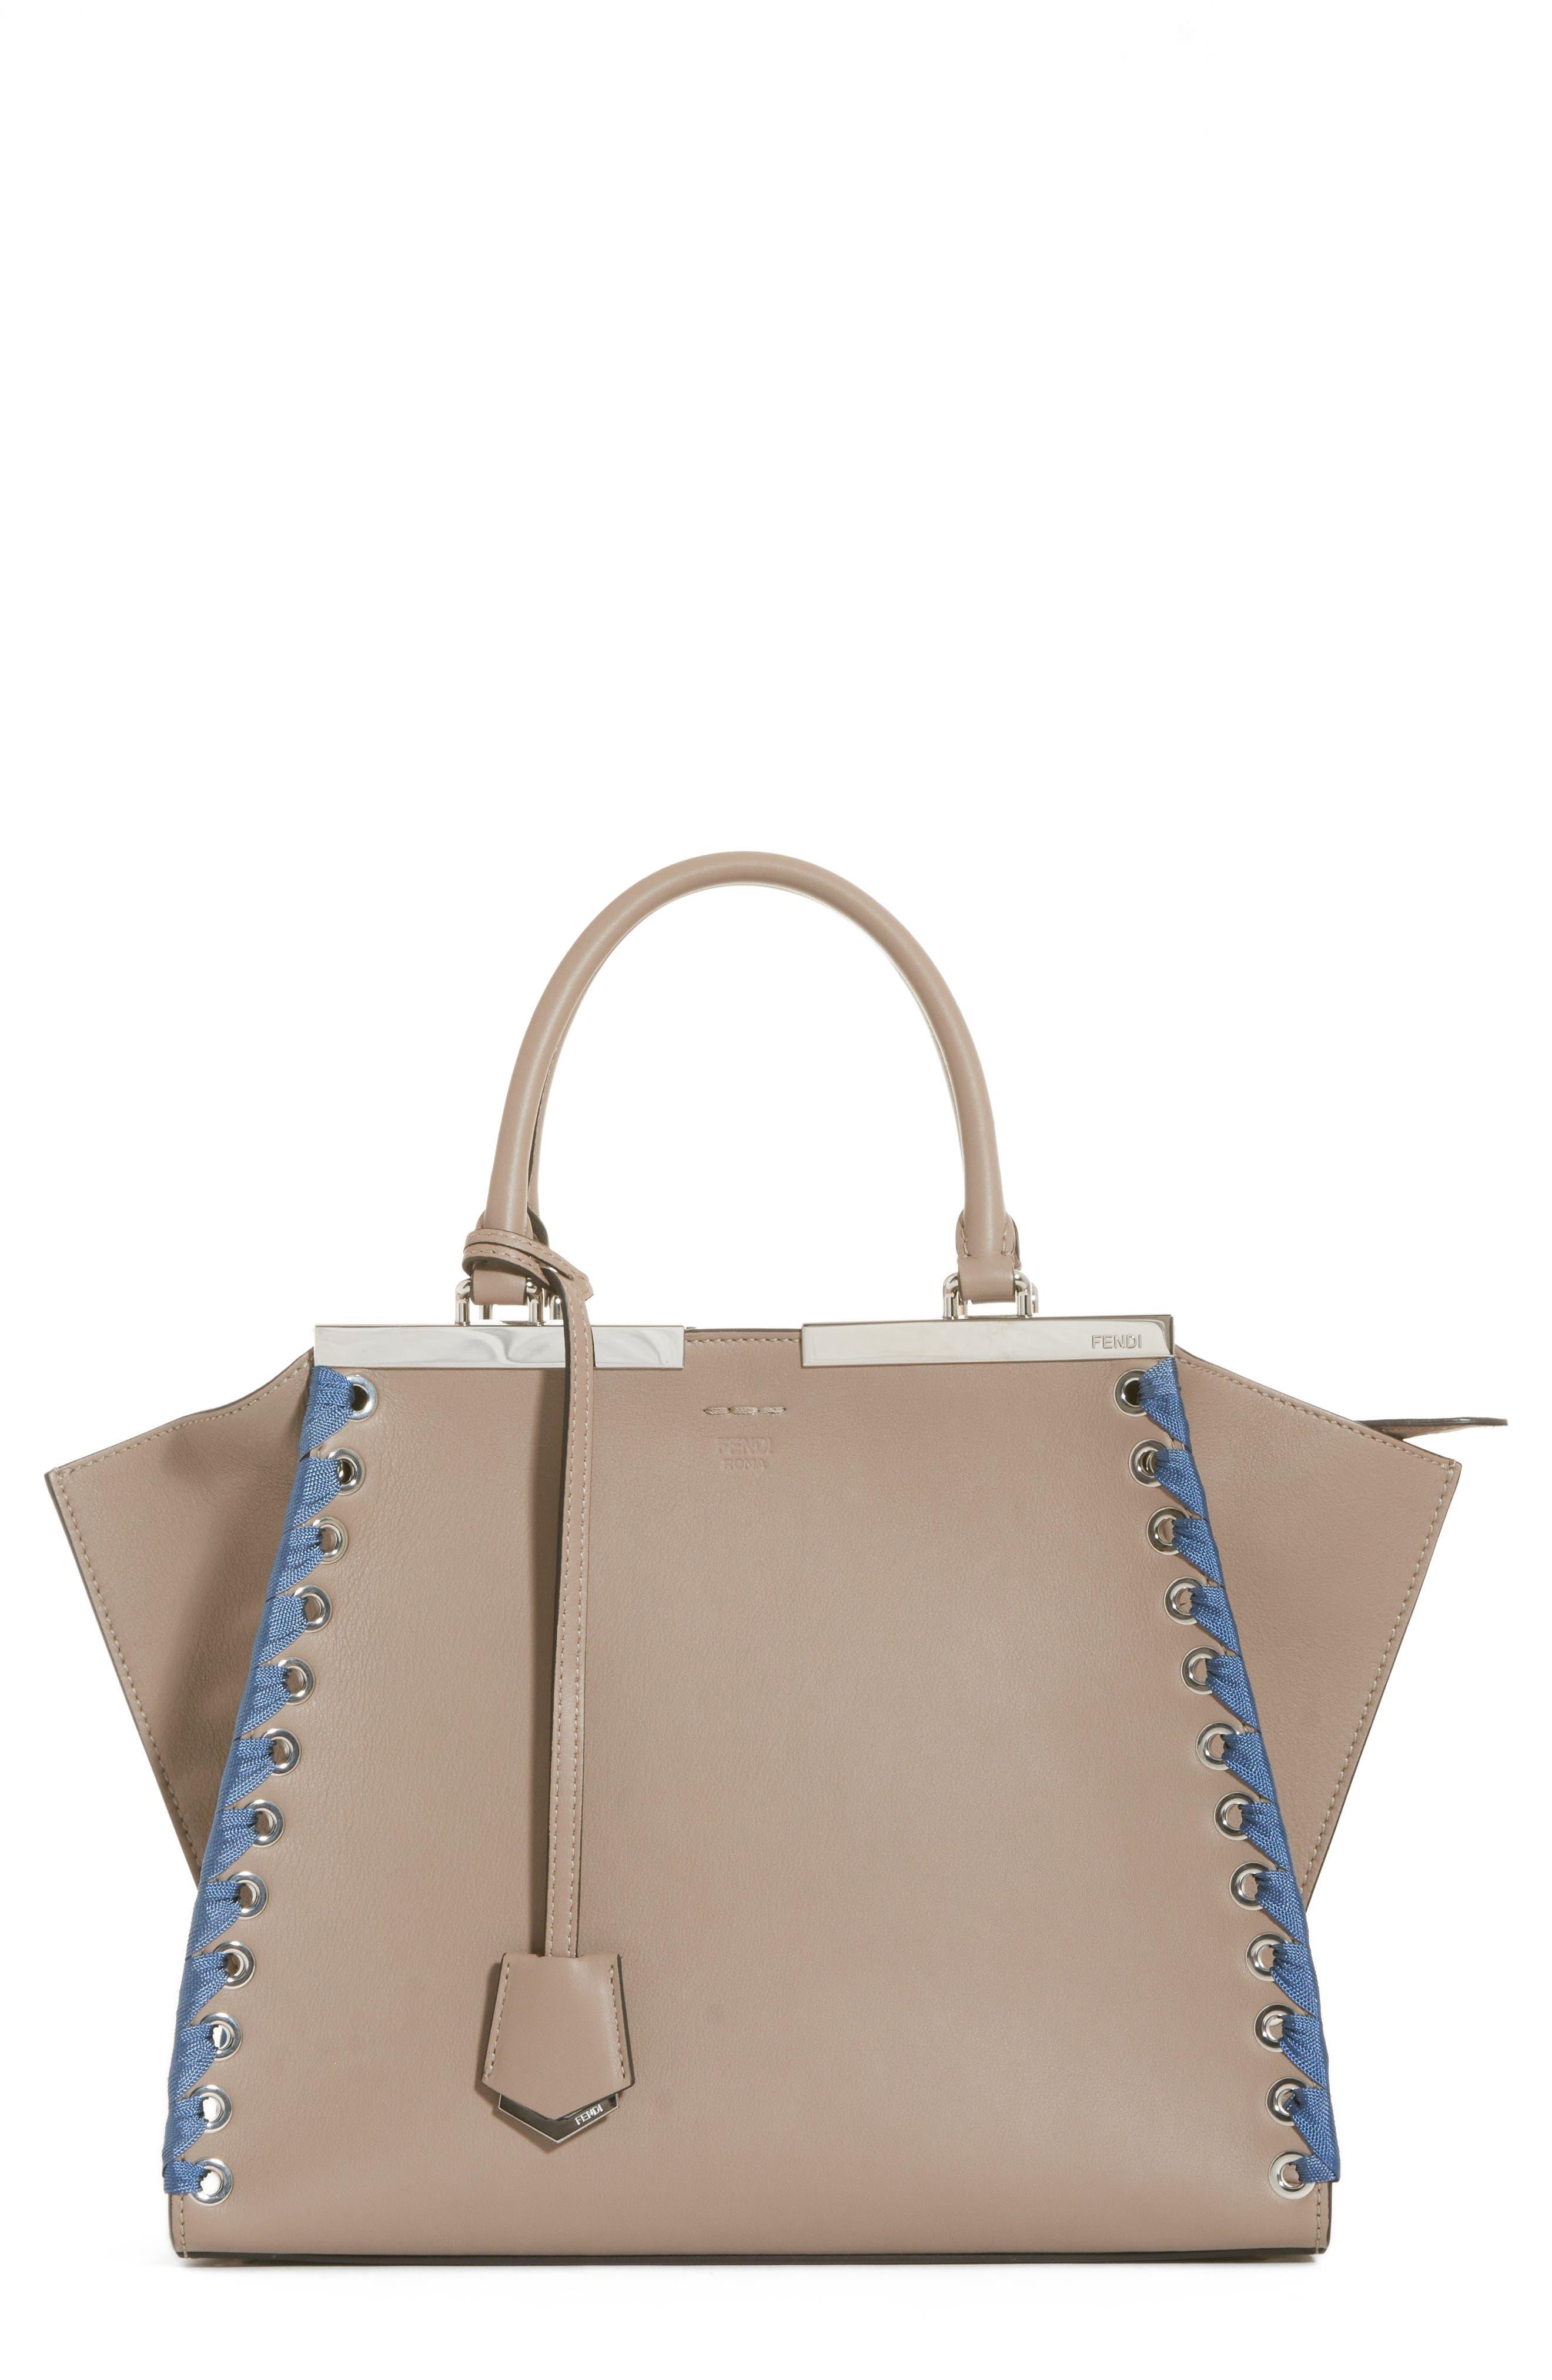 3Jours Calfskin Leather Shopper,                         Main,                         color, TORTORA/ CERULEO